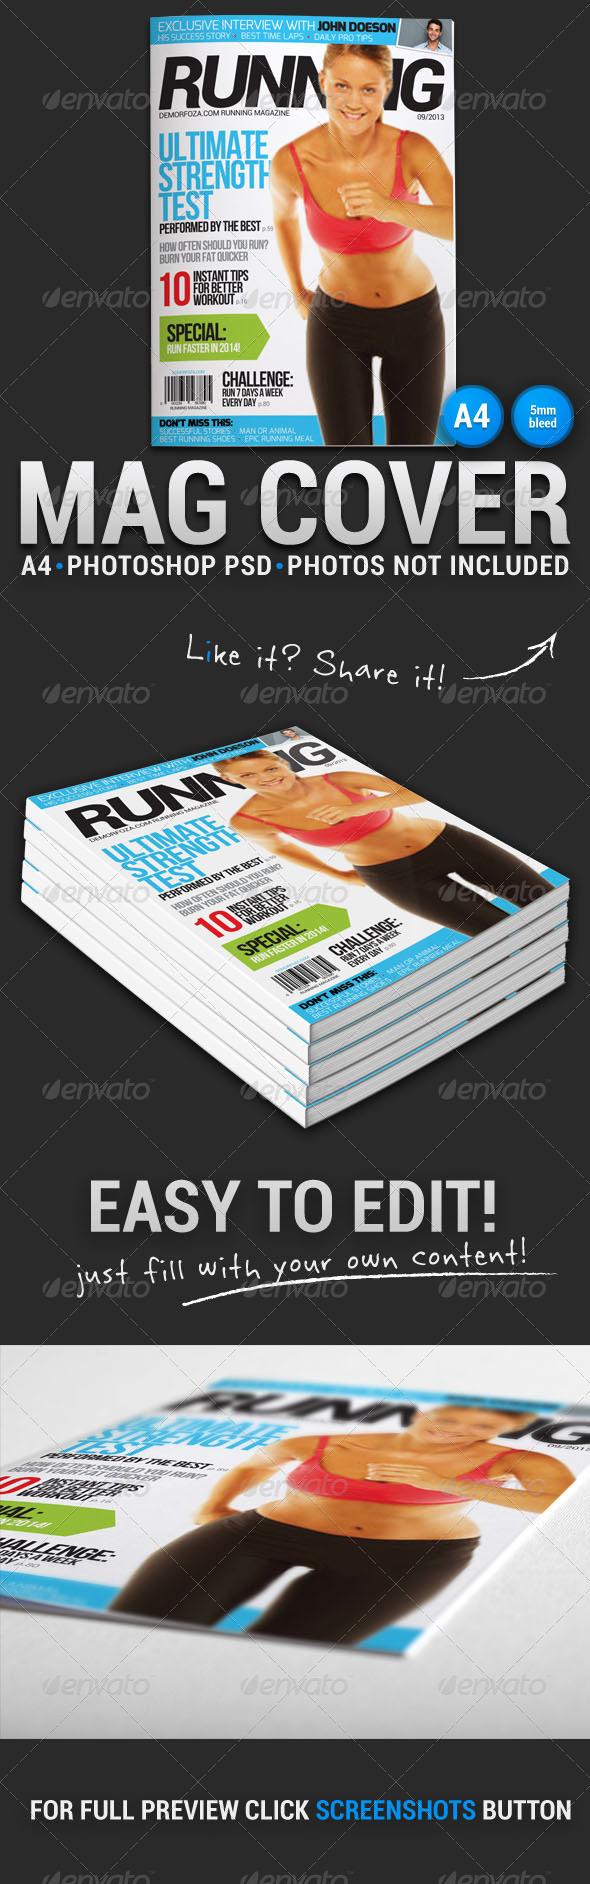 Magazine Cover 6